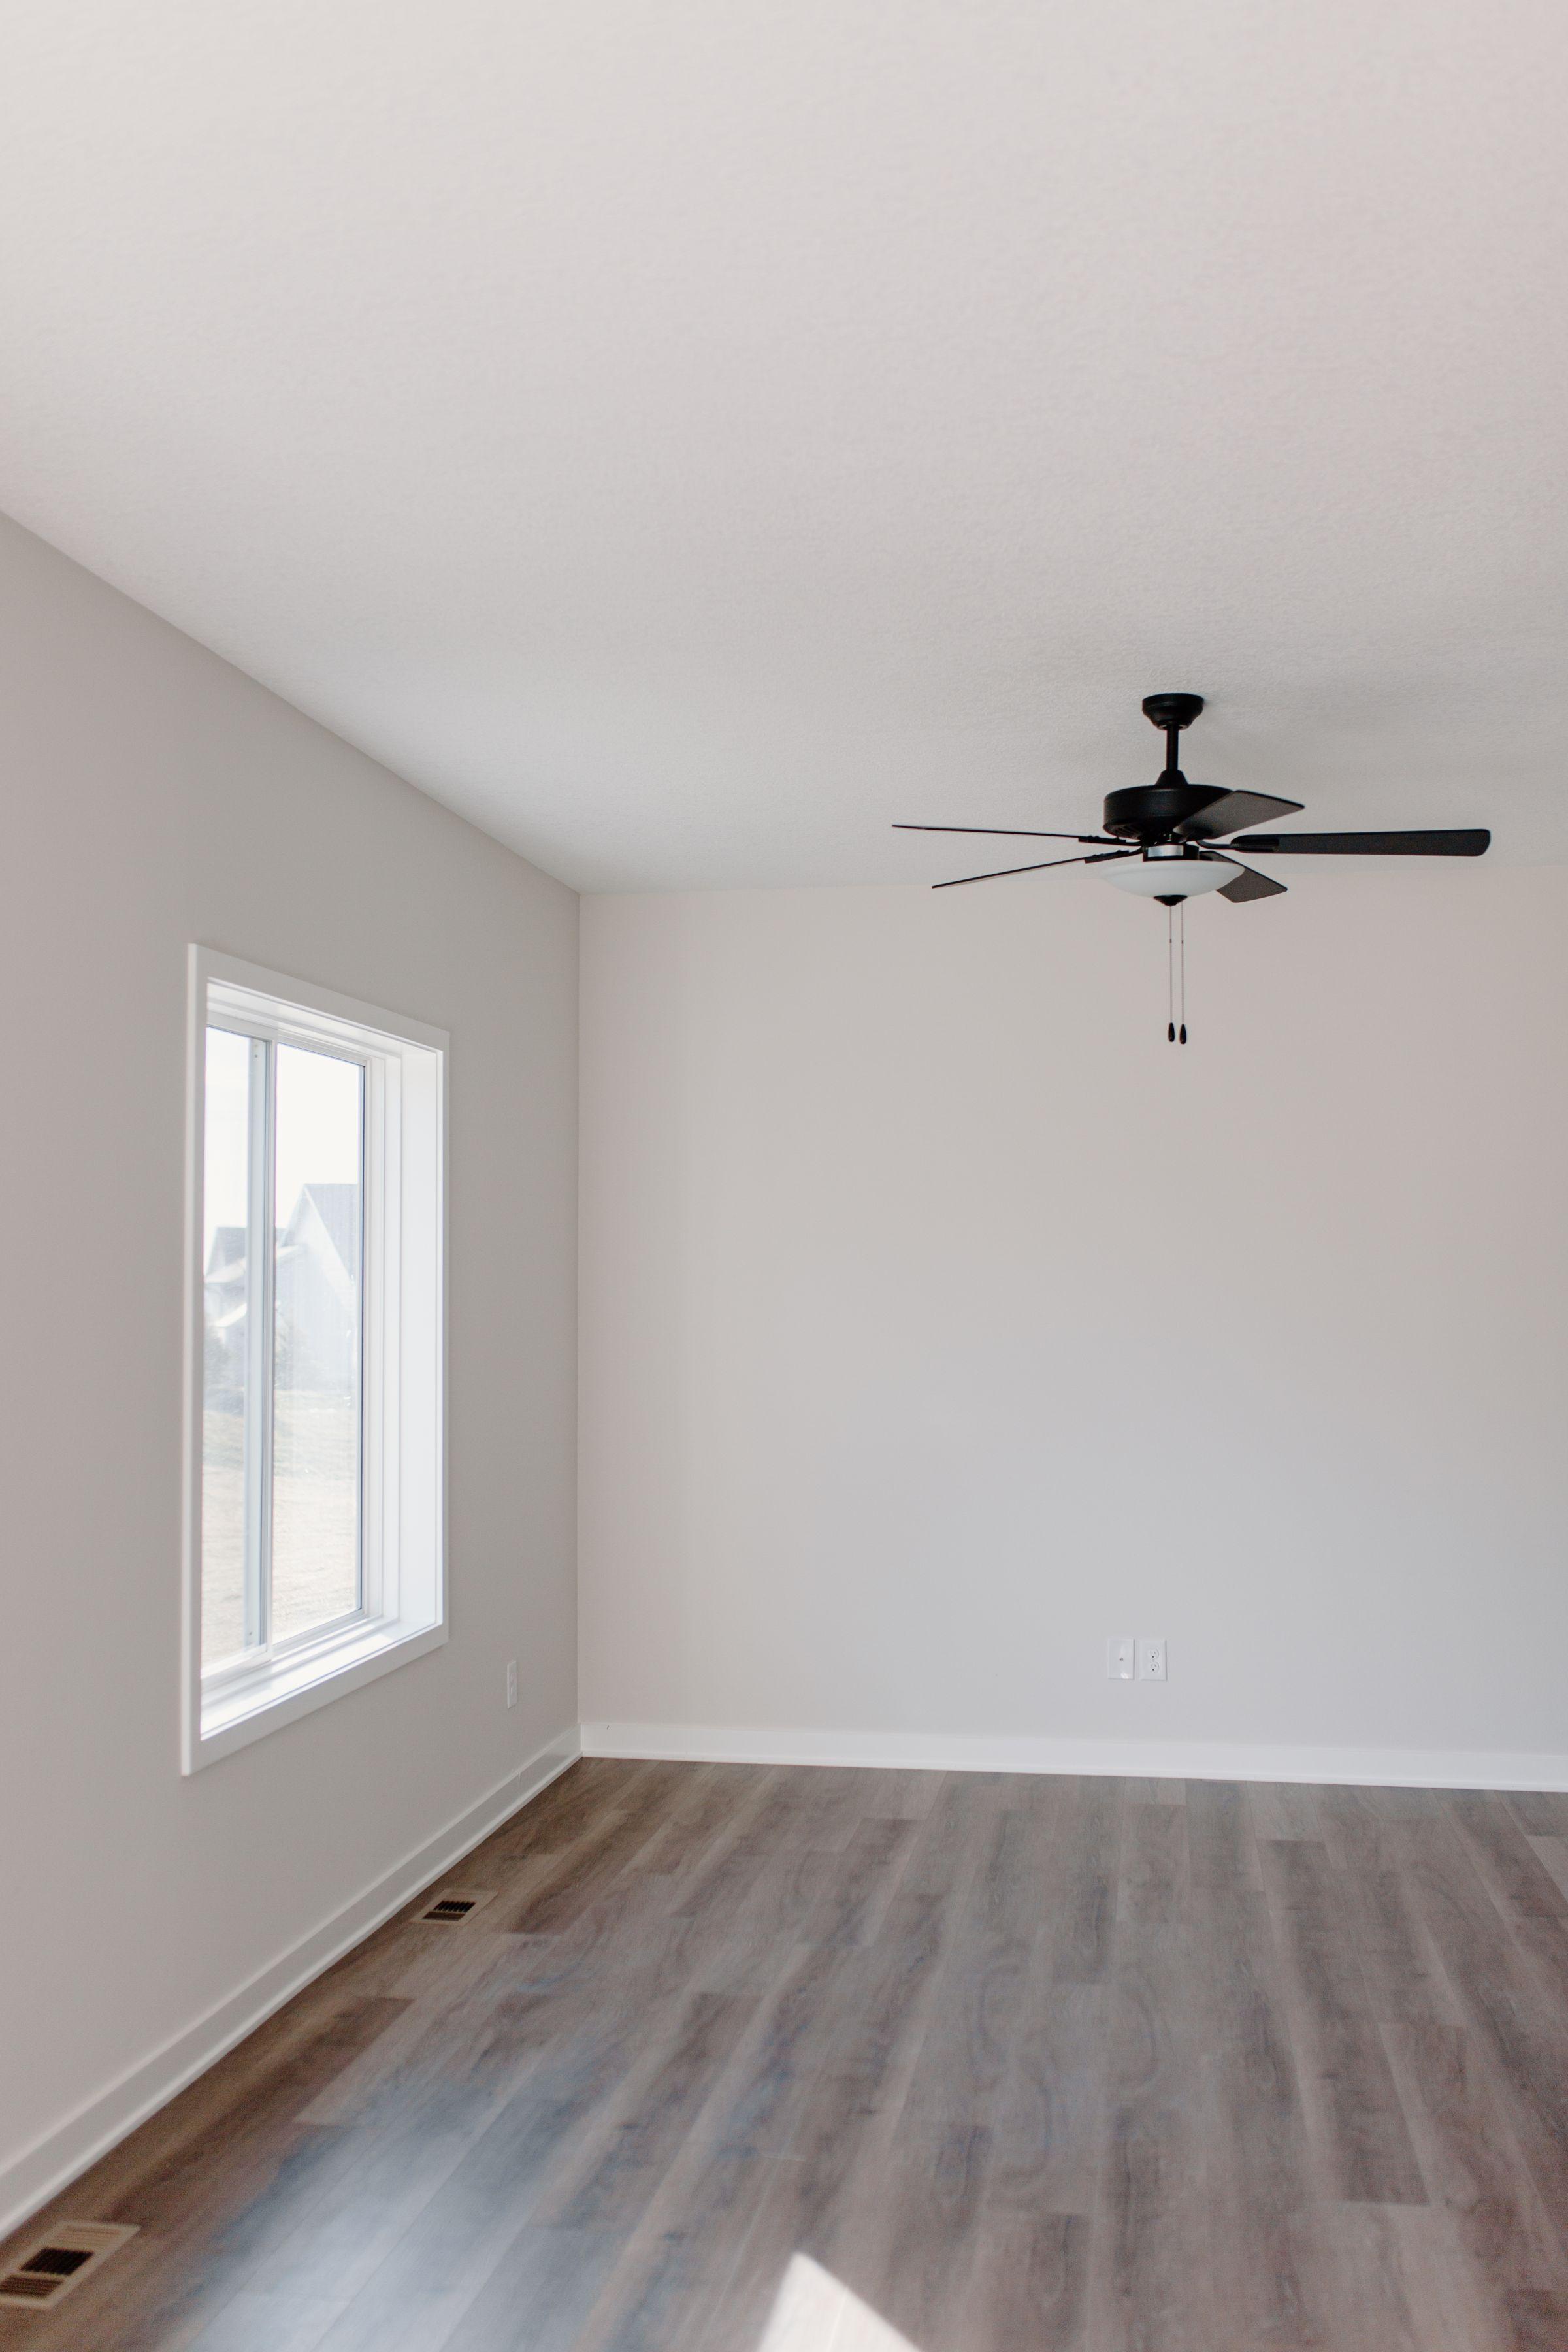 residential-warren-county-iowa-0-acres-listing-number-15140-5-2020-12-28-165259.jpg